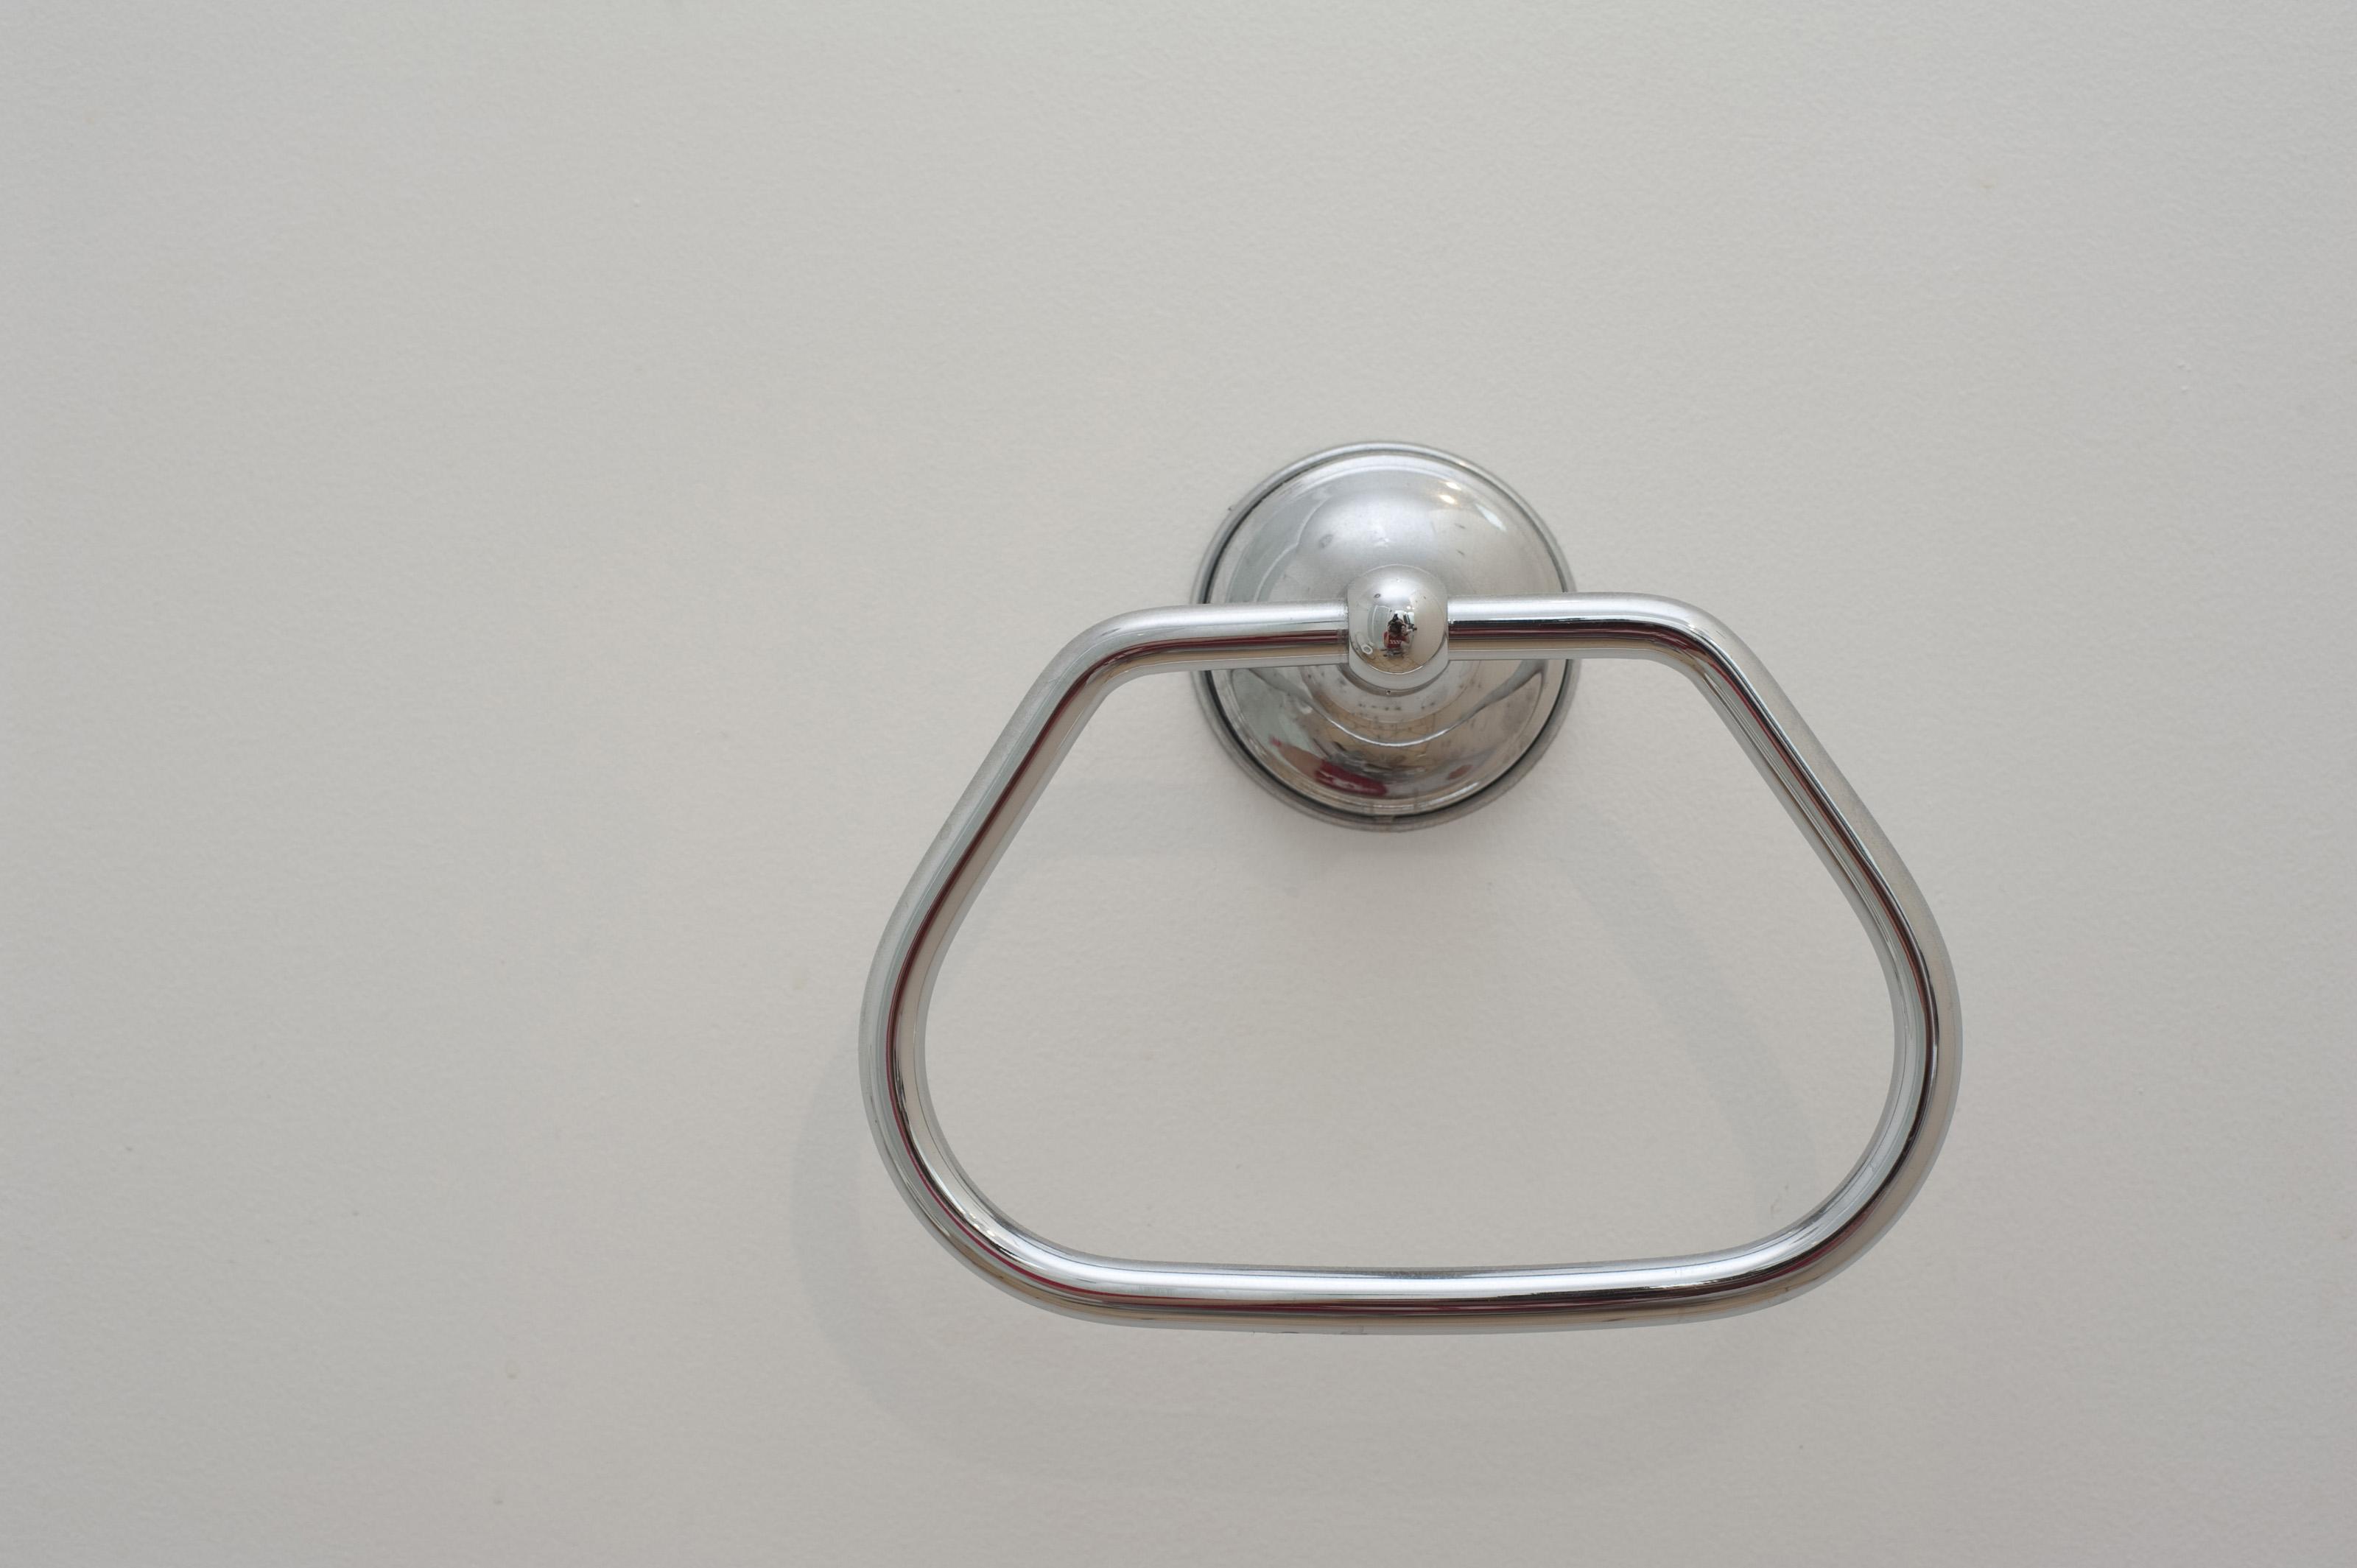 Towel Hanger Free Stock Photo 6916 Simple Stainless Steel Towel Hanger